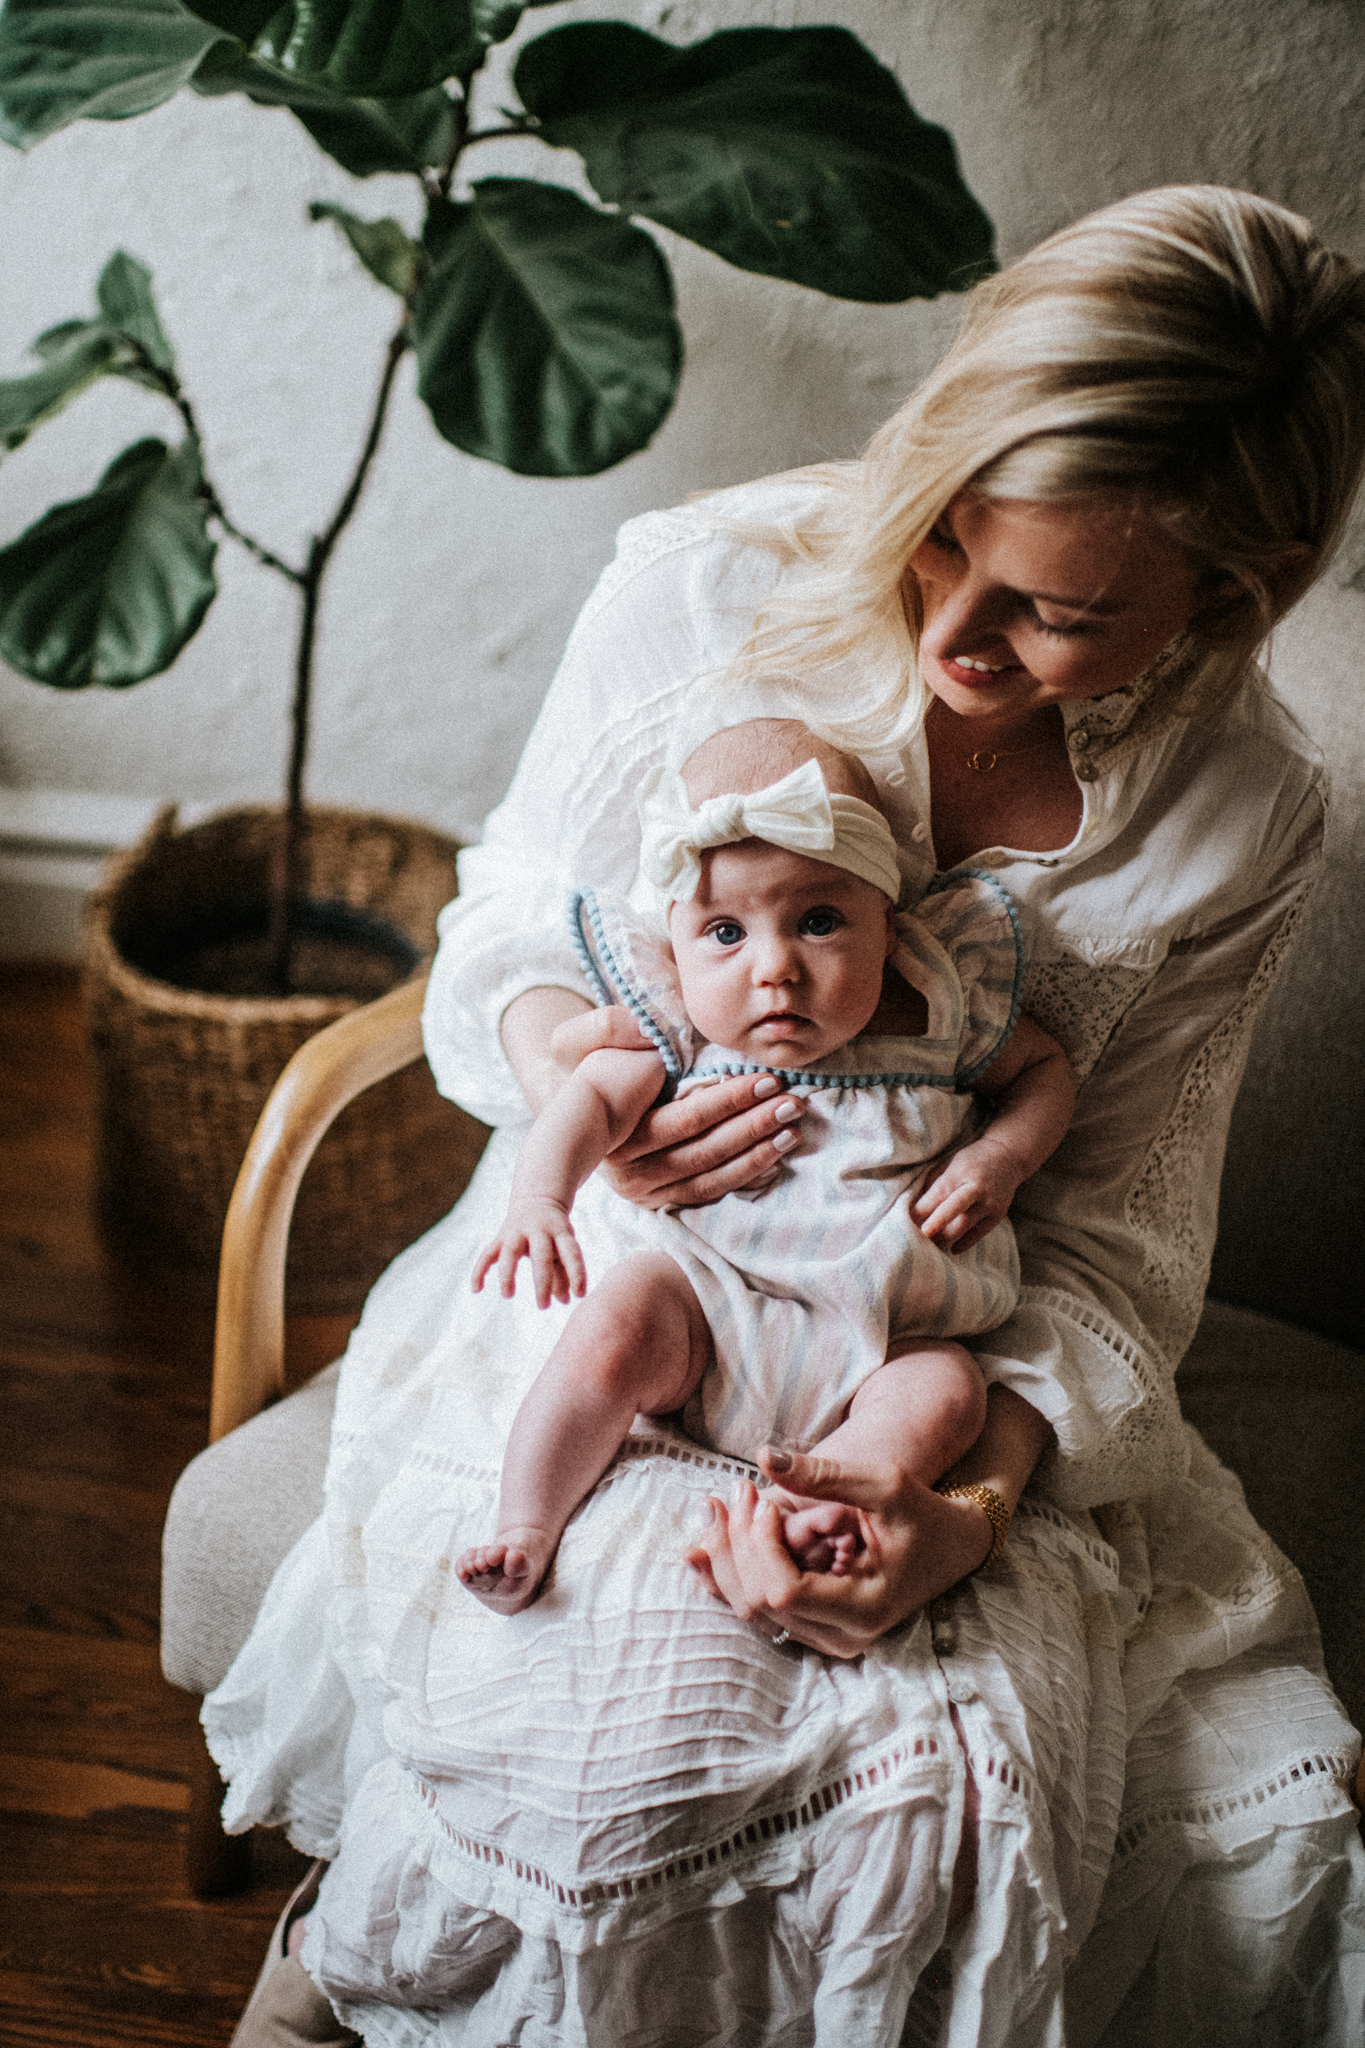 Baby_Quinn-11.jpg